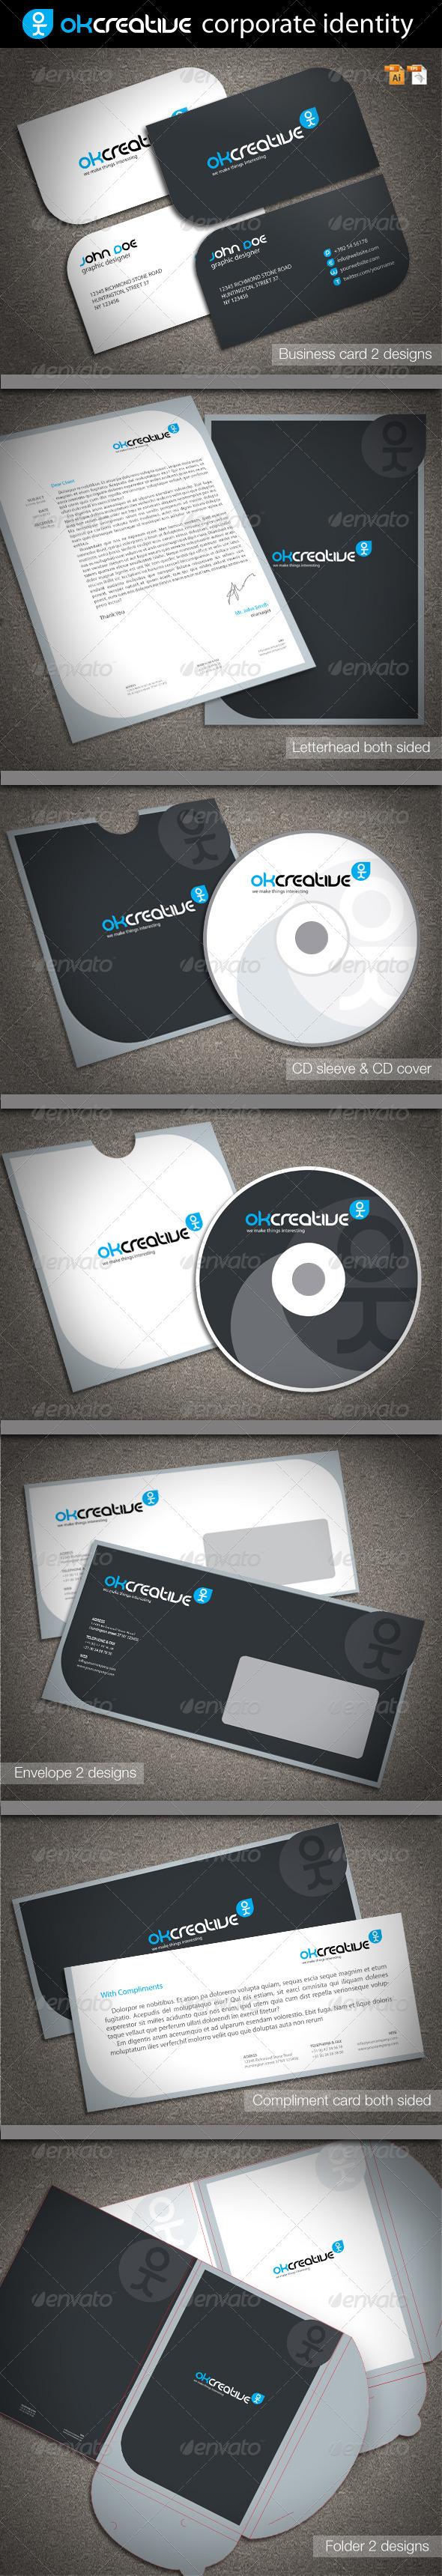 GraphicRiver OK Creative Corporate Identity 1791125